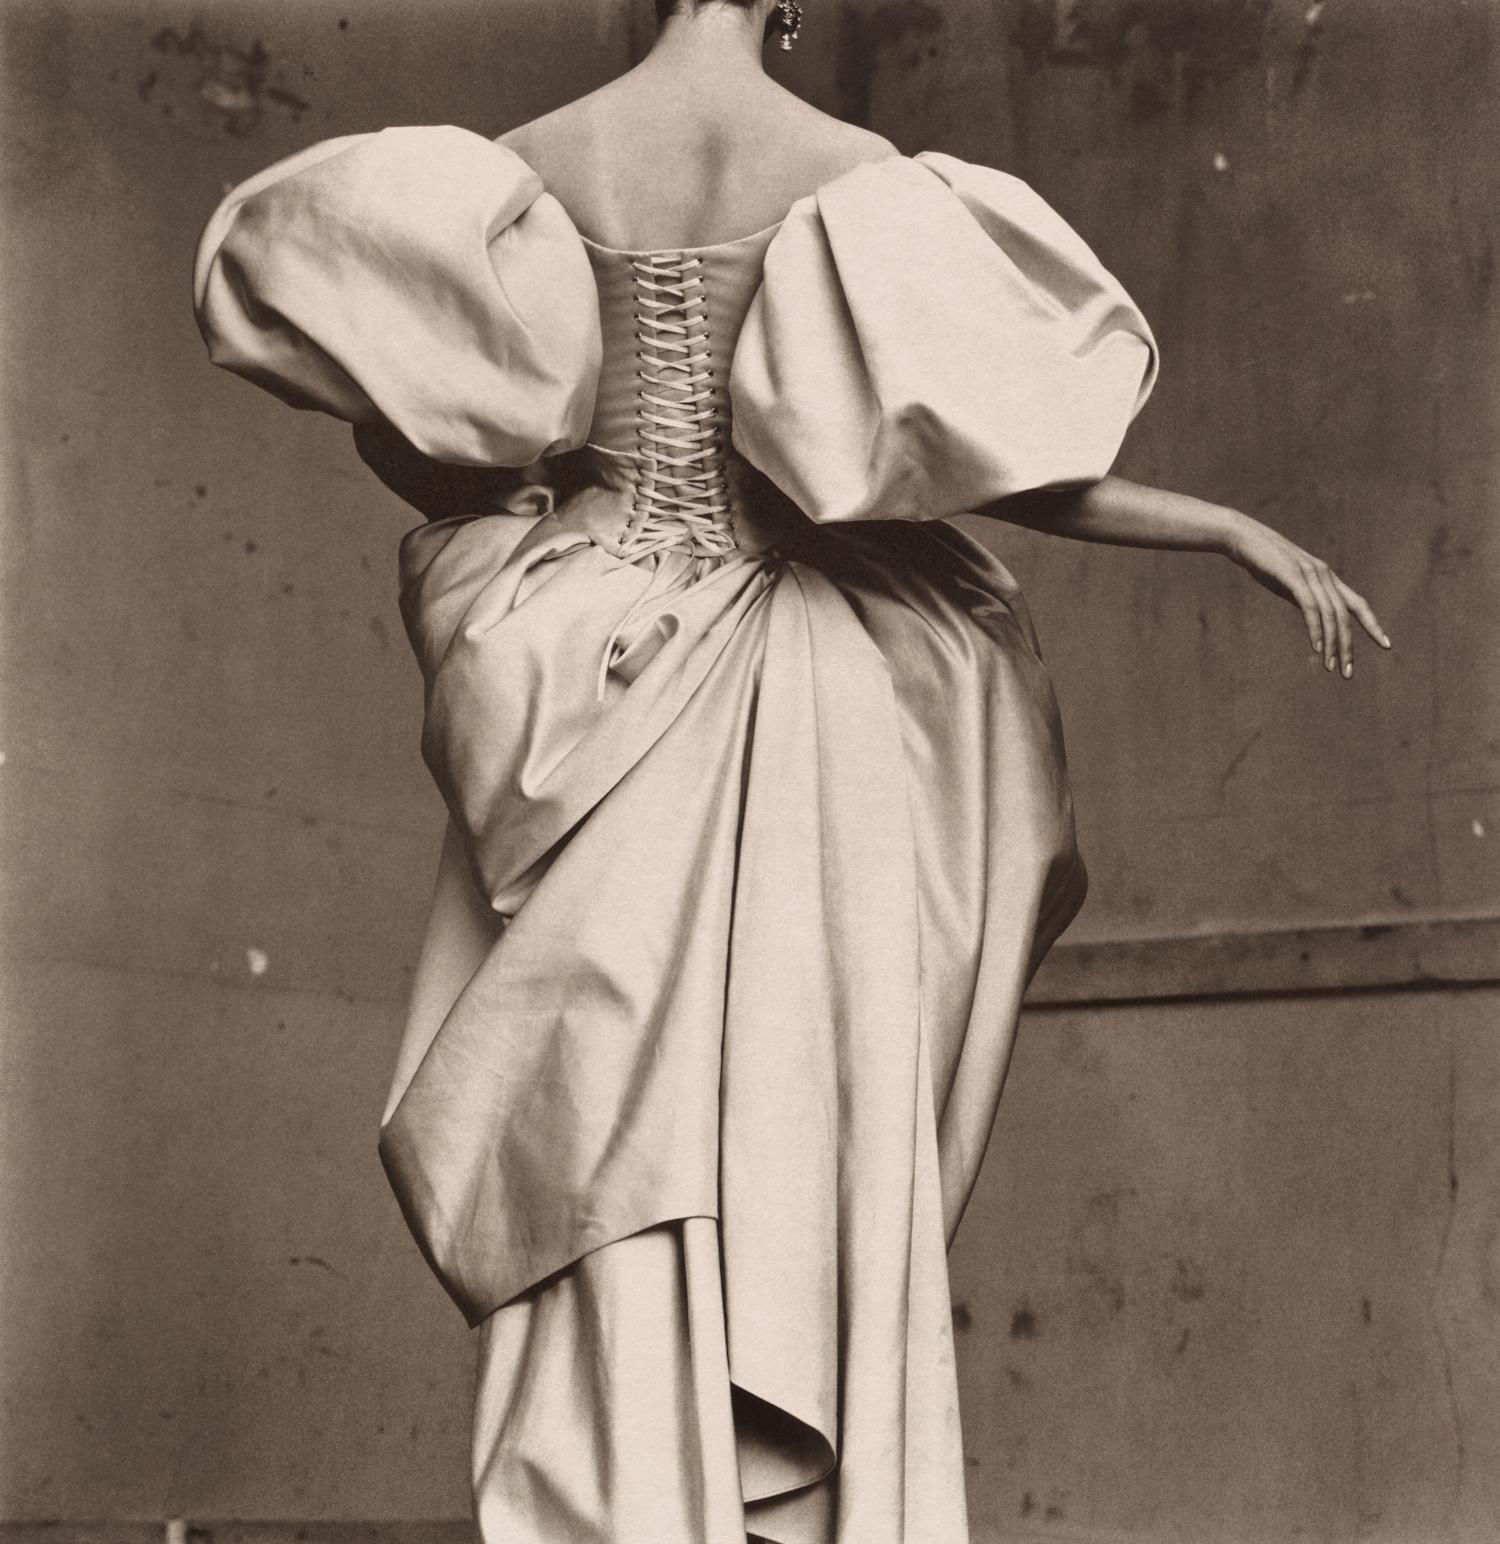 Christian Lacroix Duchesse Satin Dress , Paris, 1995 Platinum-palladium print © Condé Nast